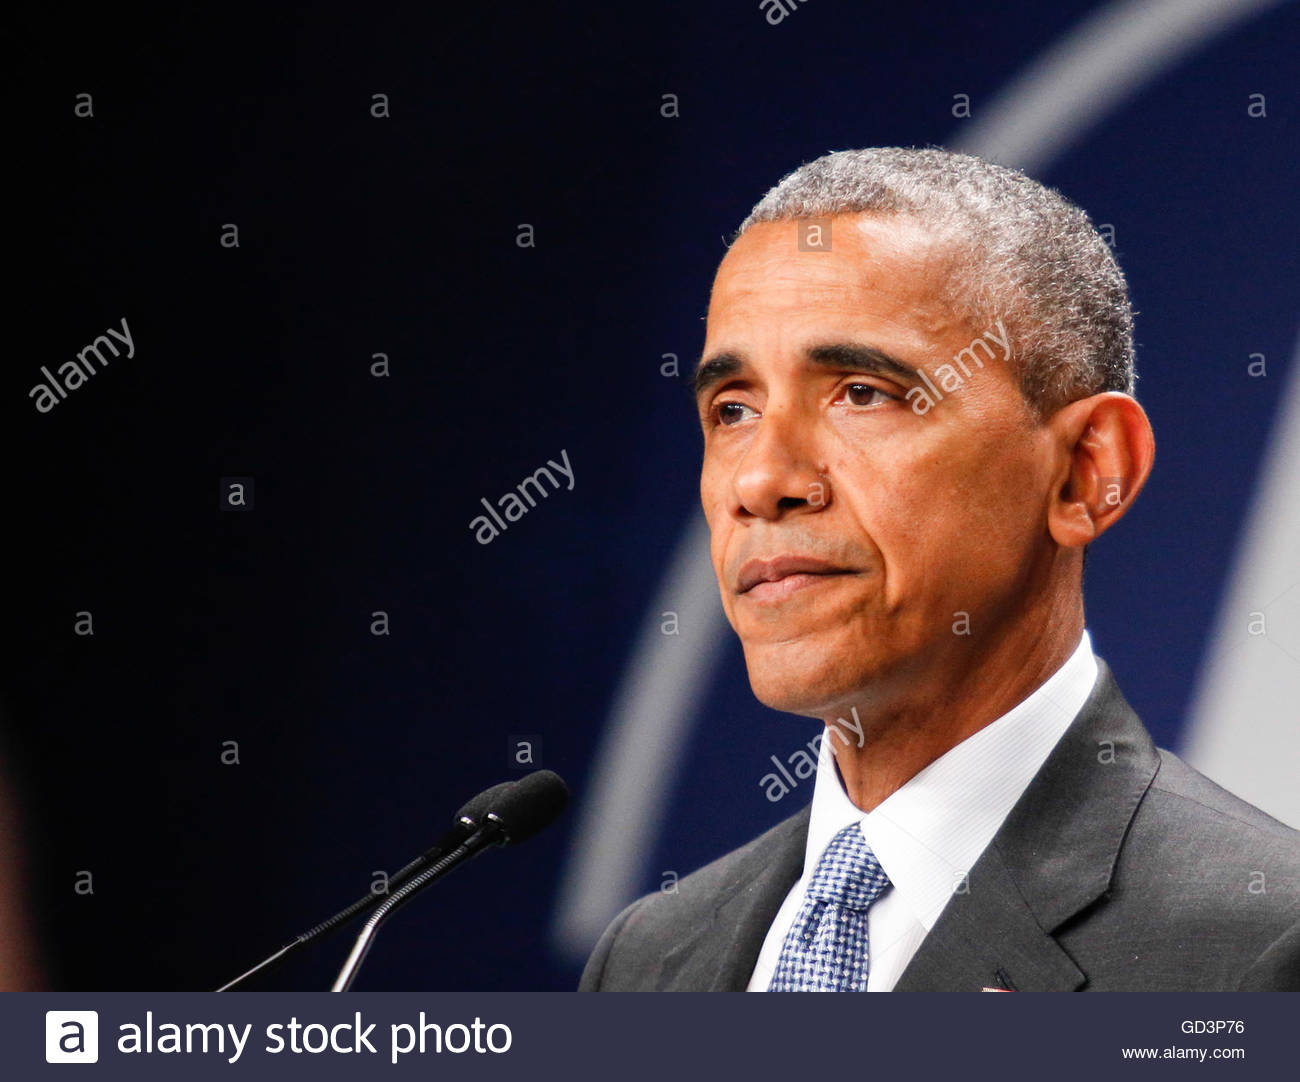 Warszawa,Poland. July 9th, 2016. POLAND, Warsaw: US President Barack Obama addresses the press on NATO summit on - Stock Image